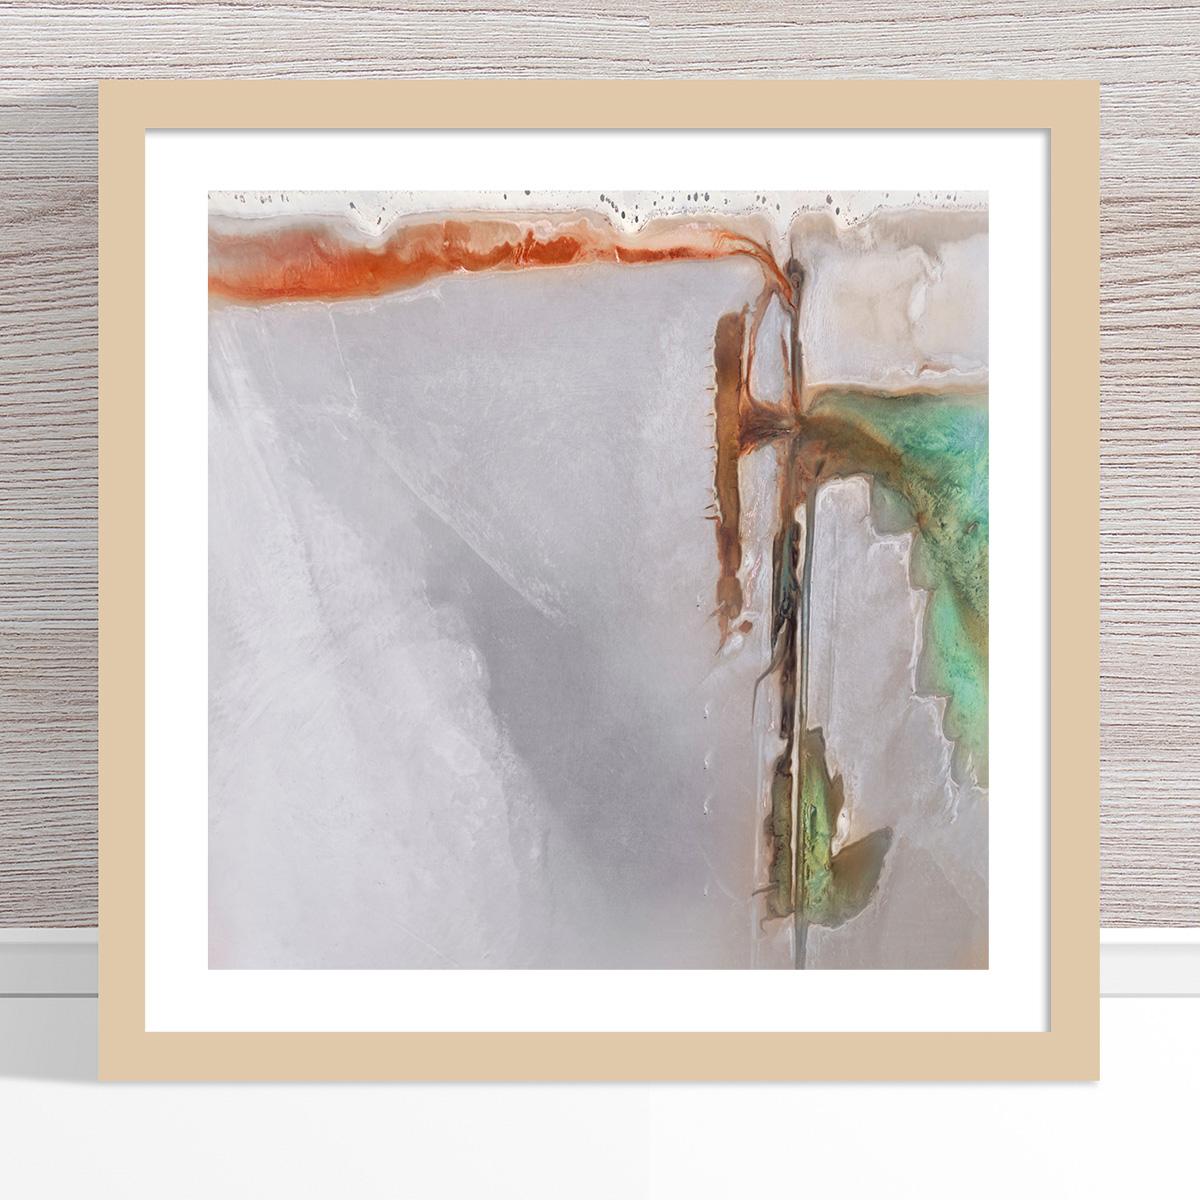 Chris Saunders - 'Aerial Salt 004' Light Frame